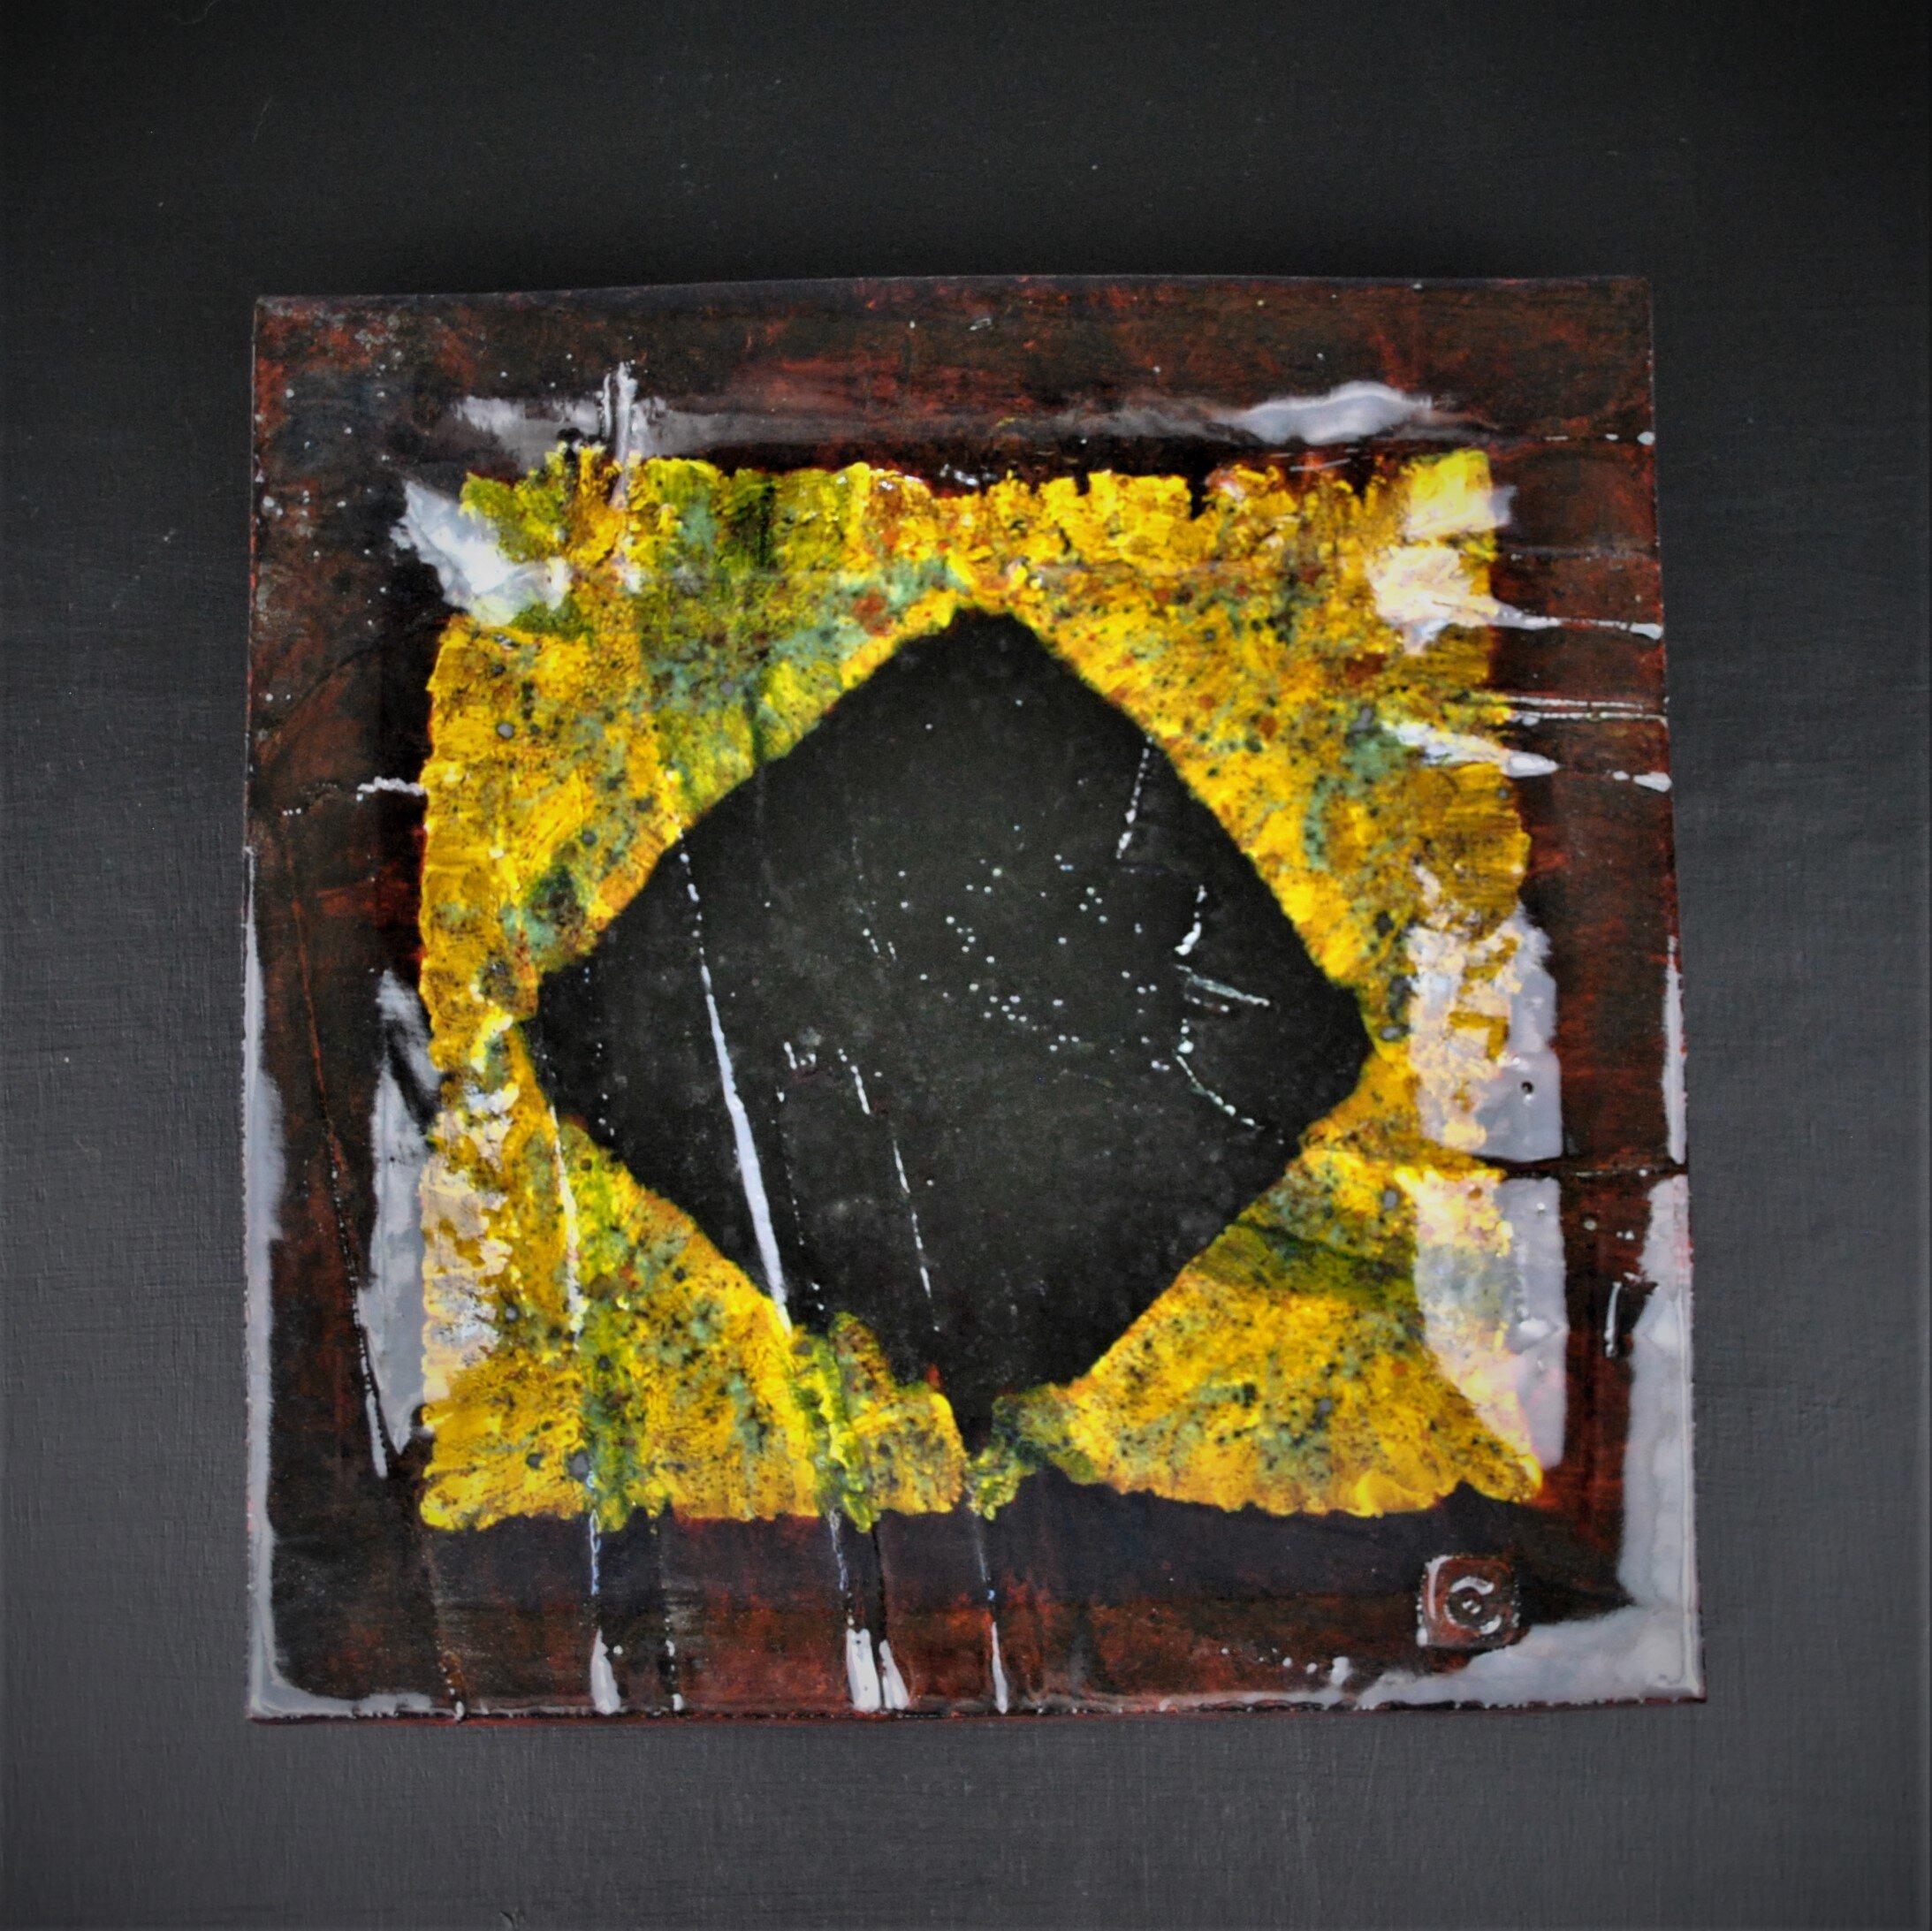 Mike Cain 2018 Brown diamond on yellow against black. (Square edit) DSC_6245 (2).JPG